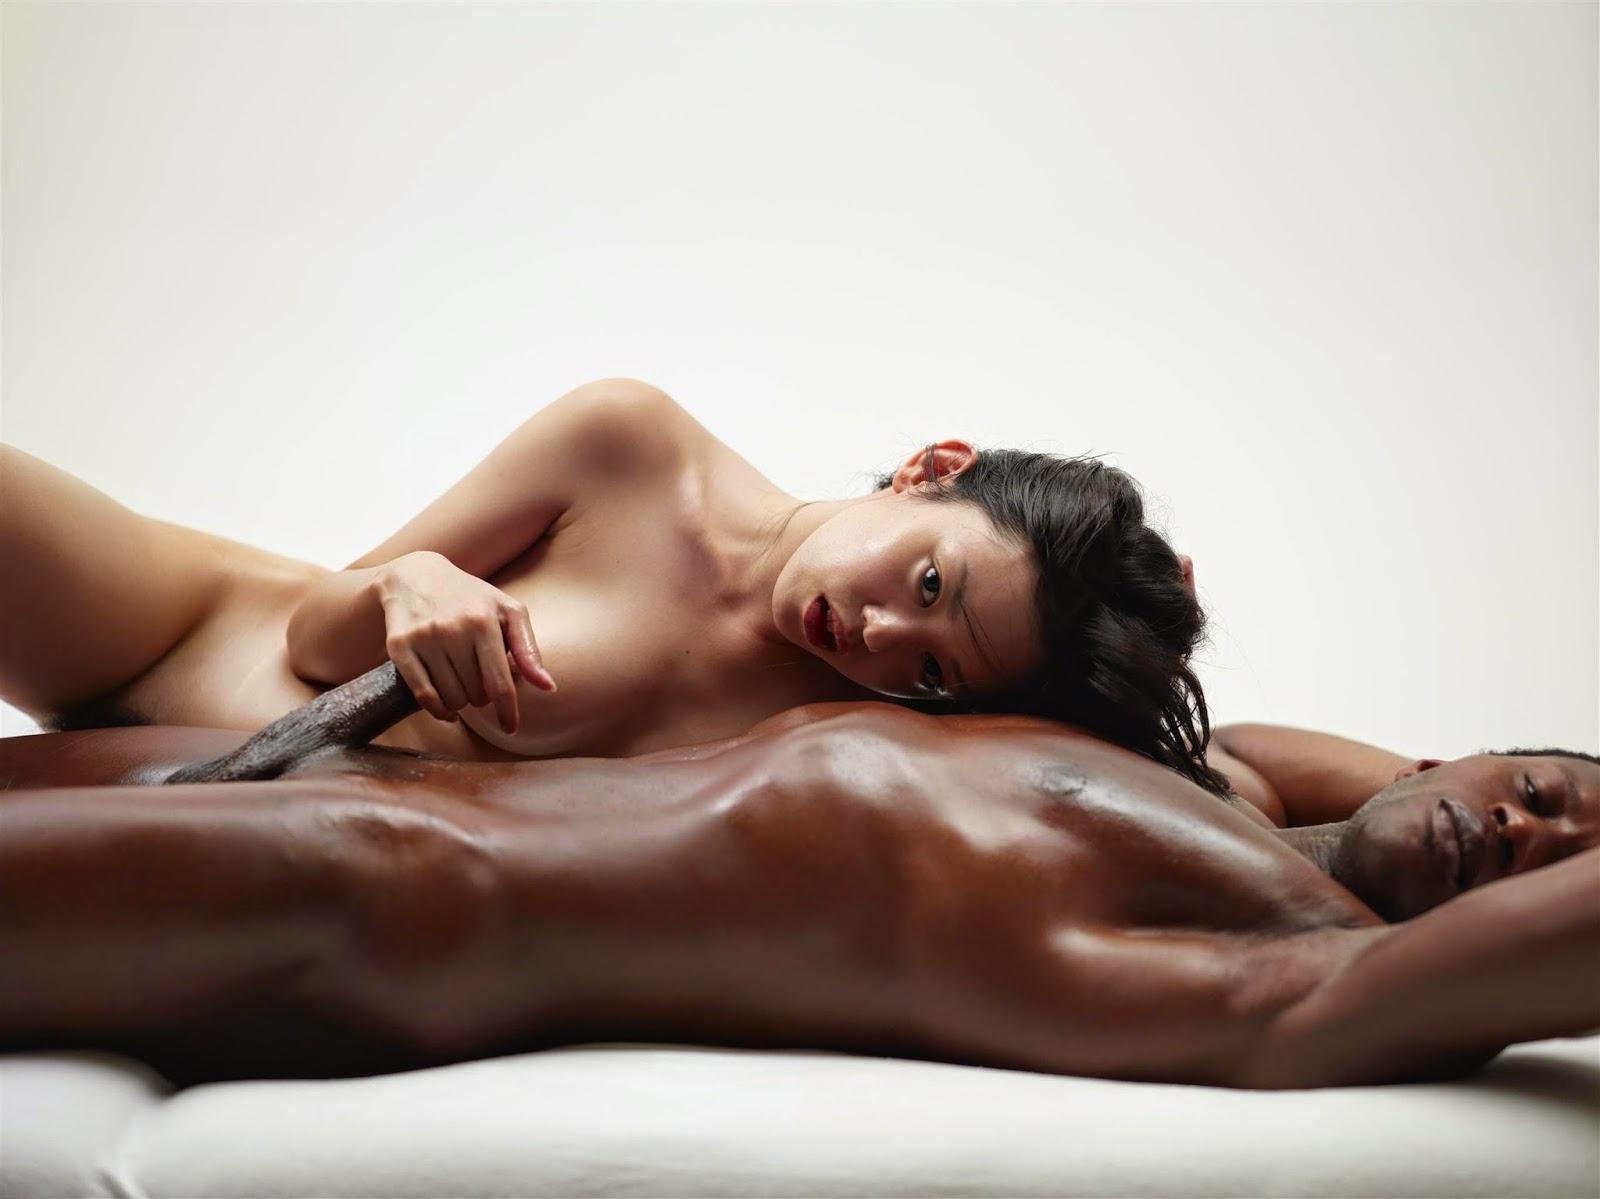 Naked Art Photos 49